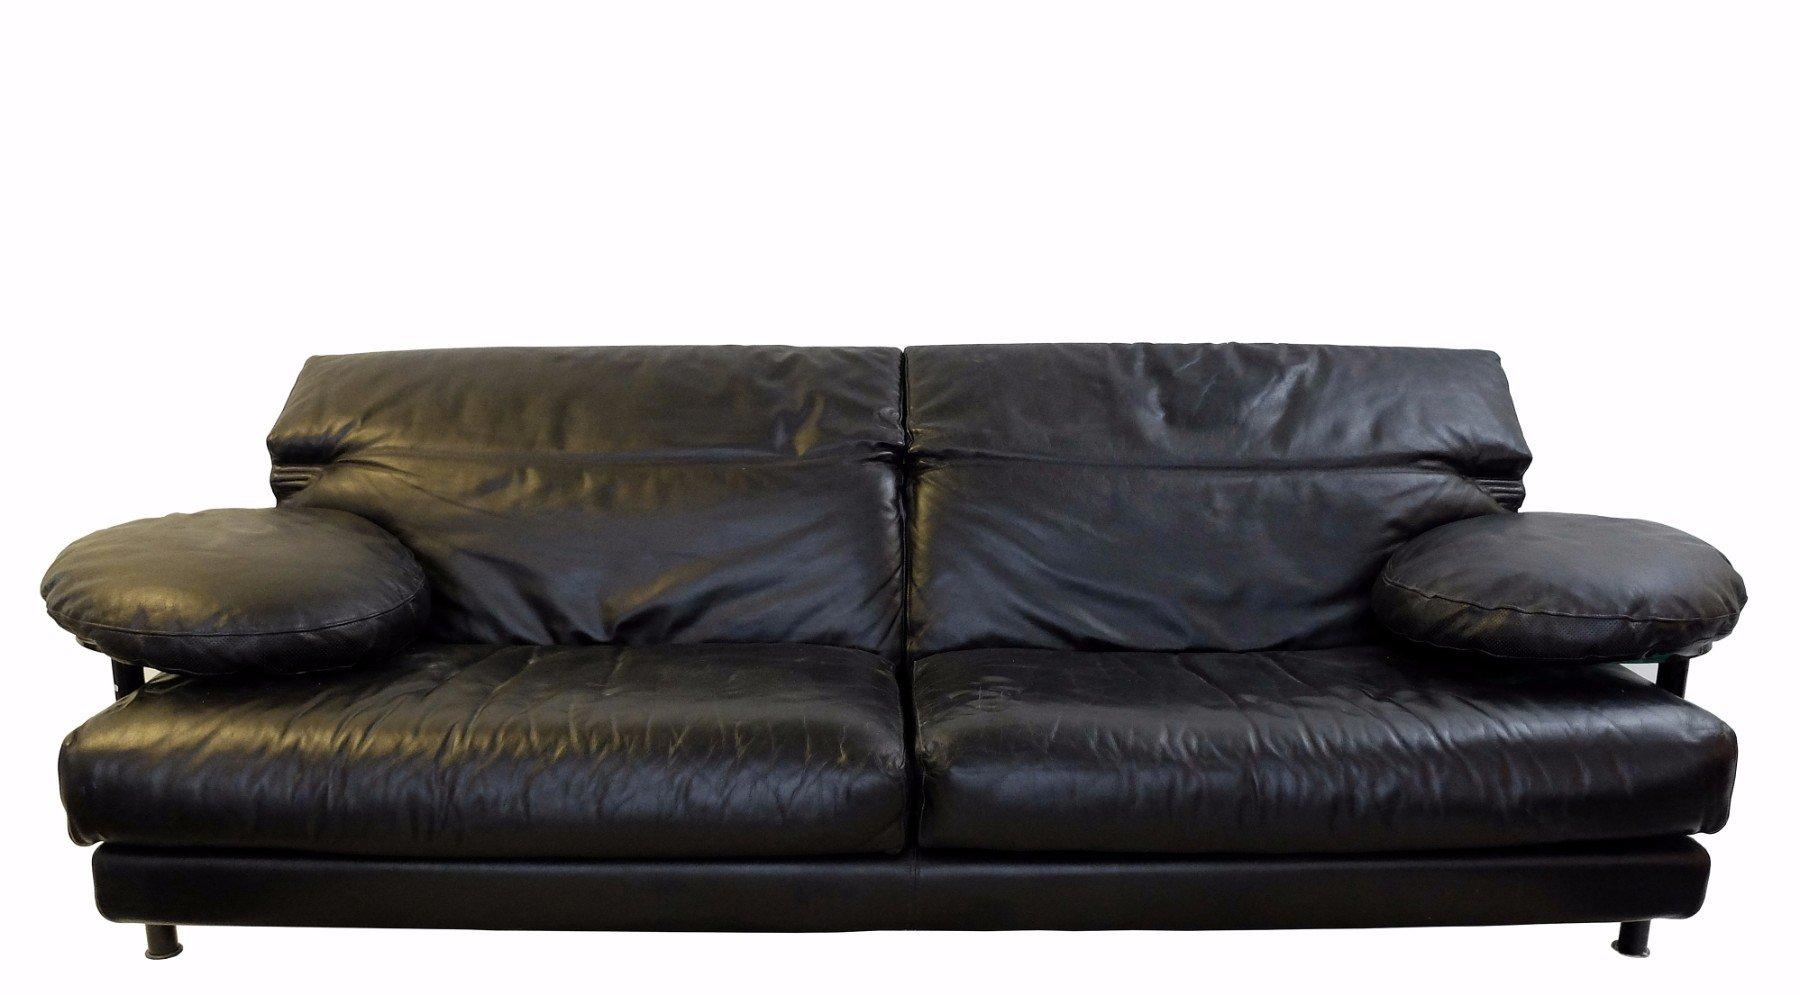 Vintage arca black leather sofa by paolo piva for b b italia for sale at pamono B b italia sofa for sale